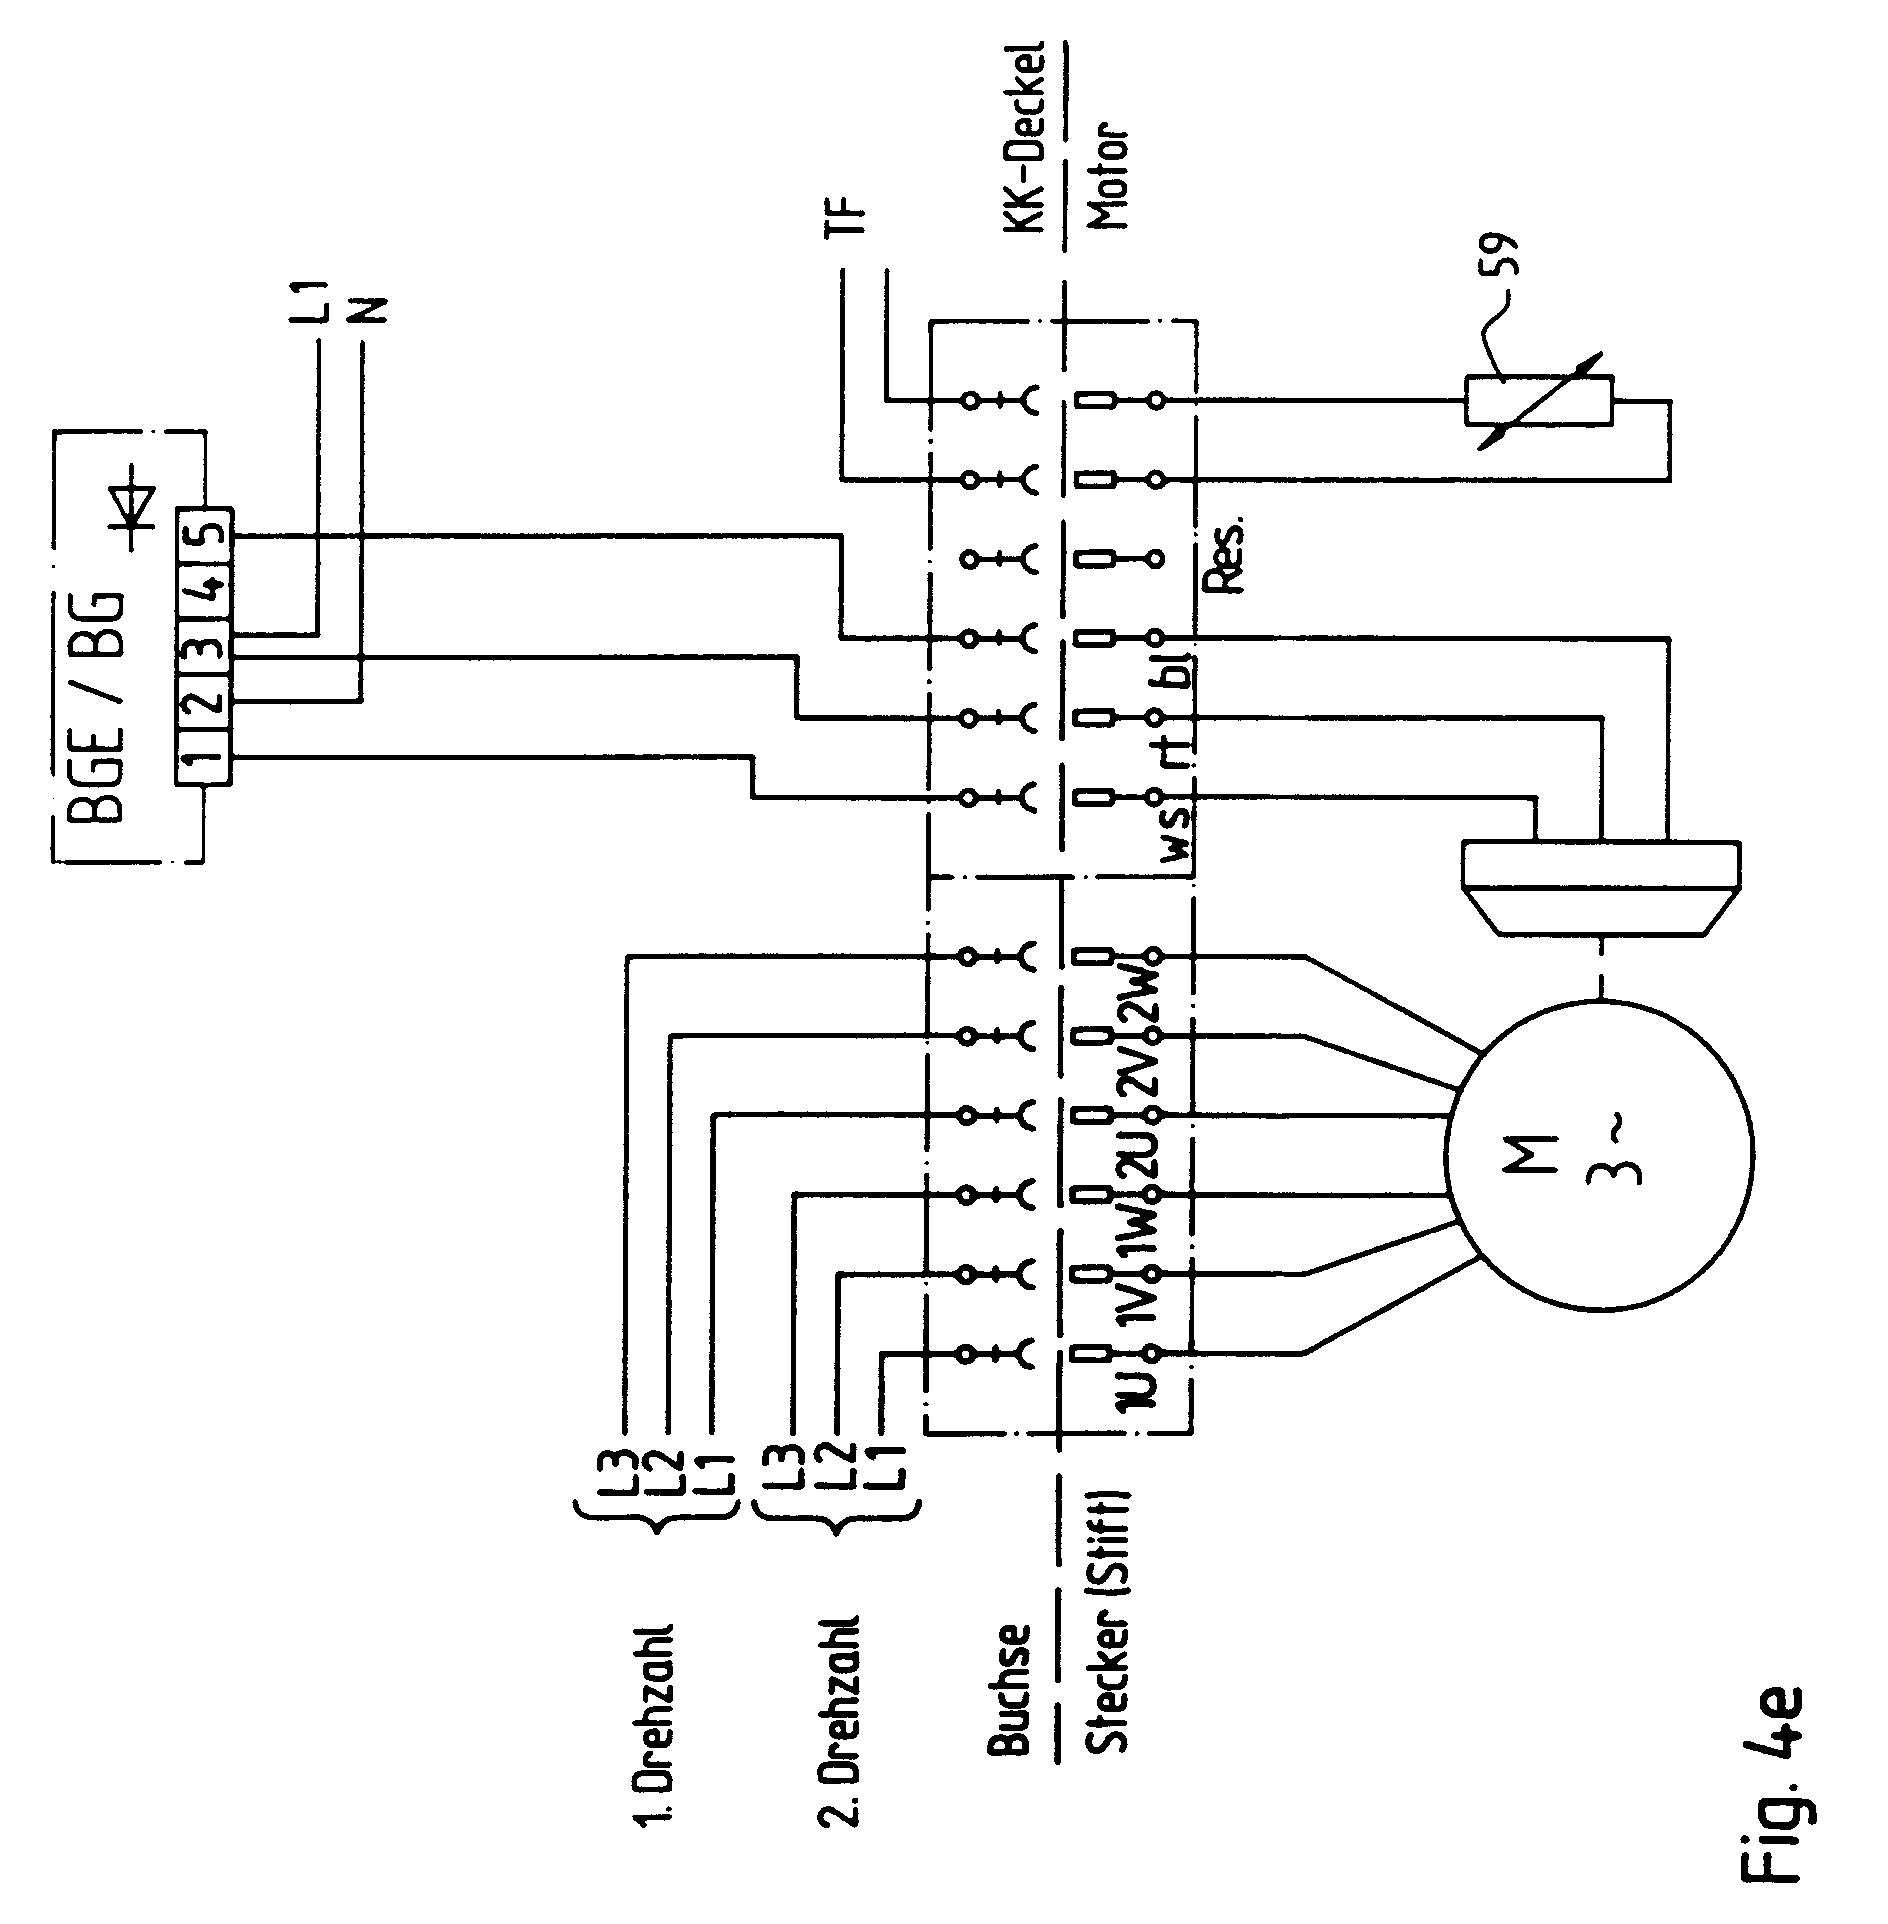 Eurodrive Wiring Diagrams Odes Atv Winch Wiring Diagram Bege Wiring Diagram